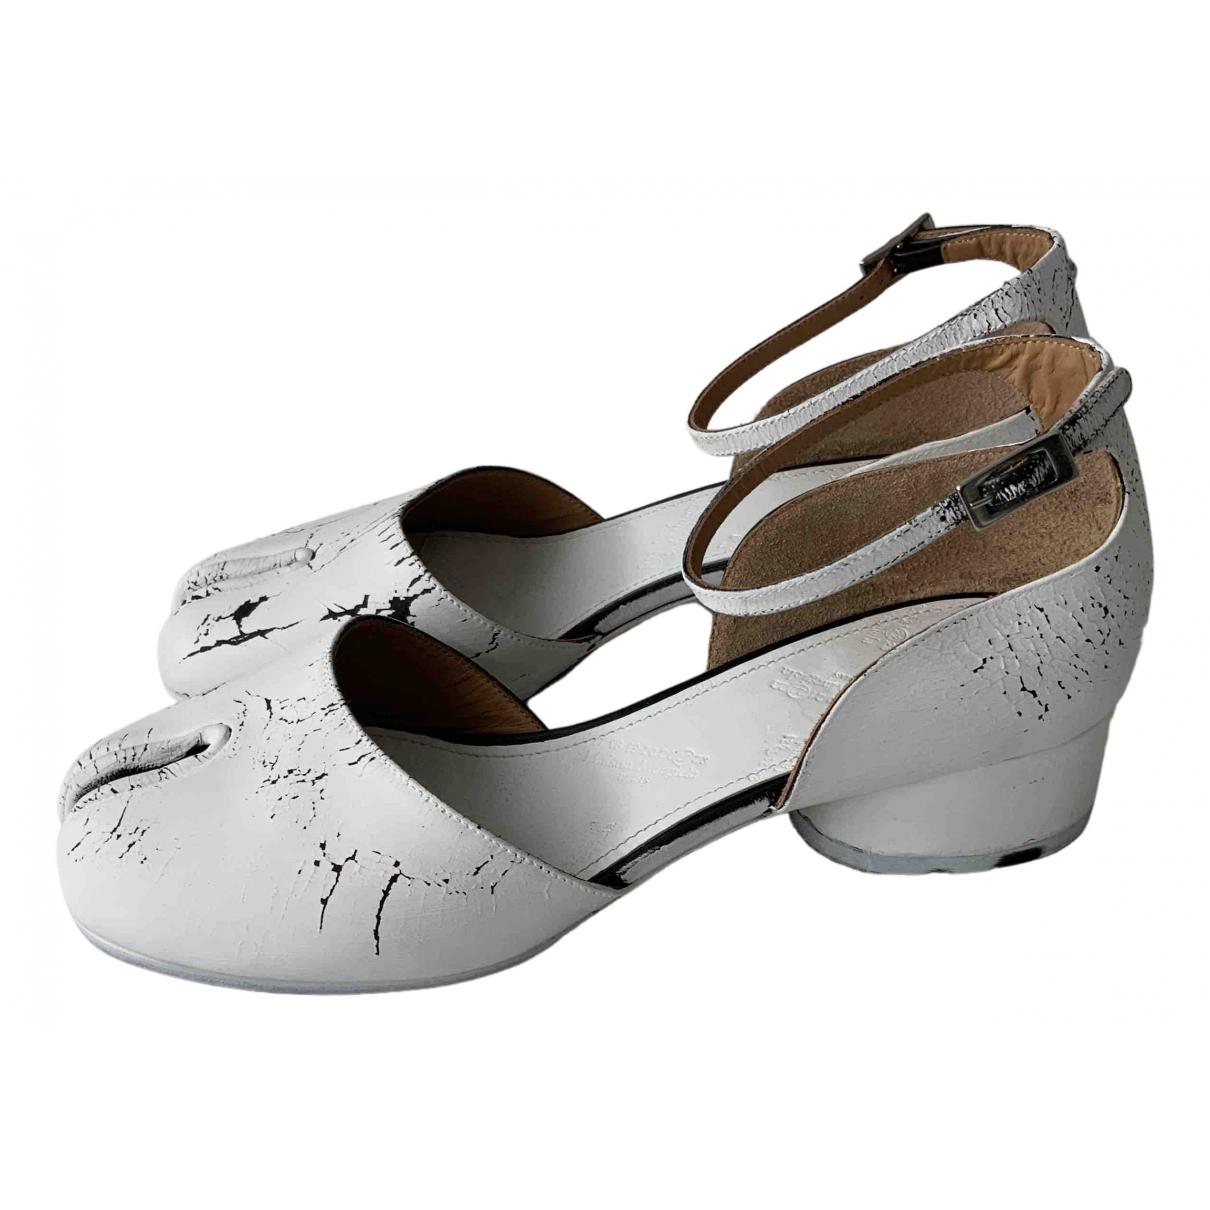 Maison Martin Margiela \N White Leather Heels for Women 38 EU